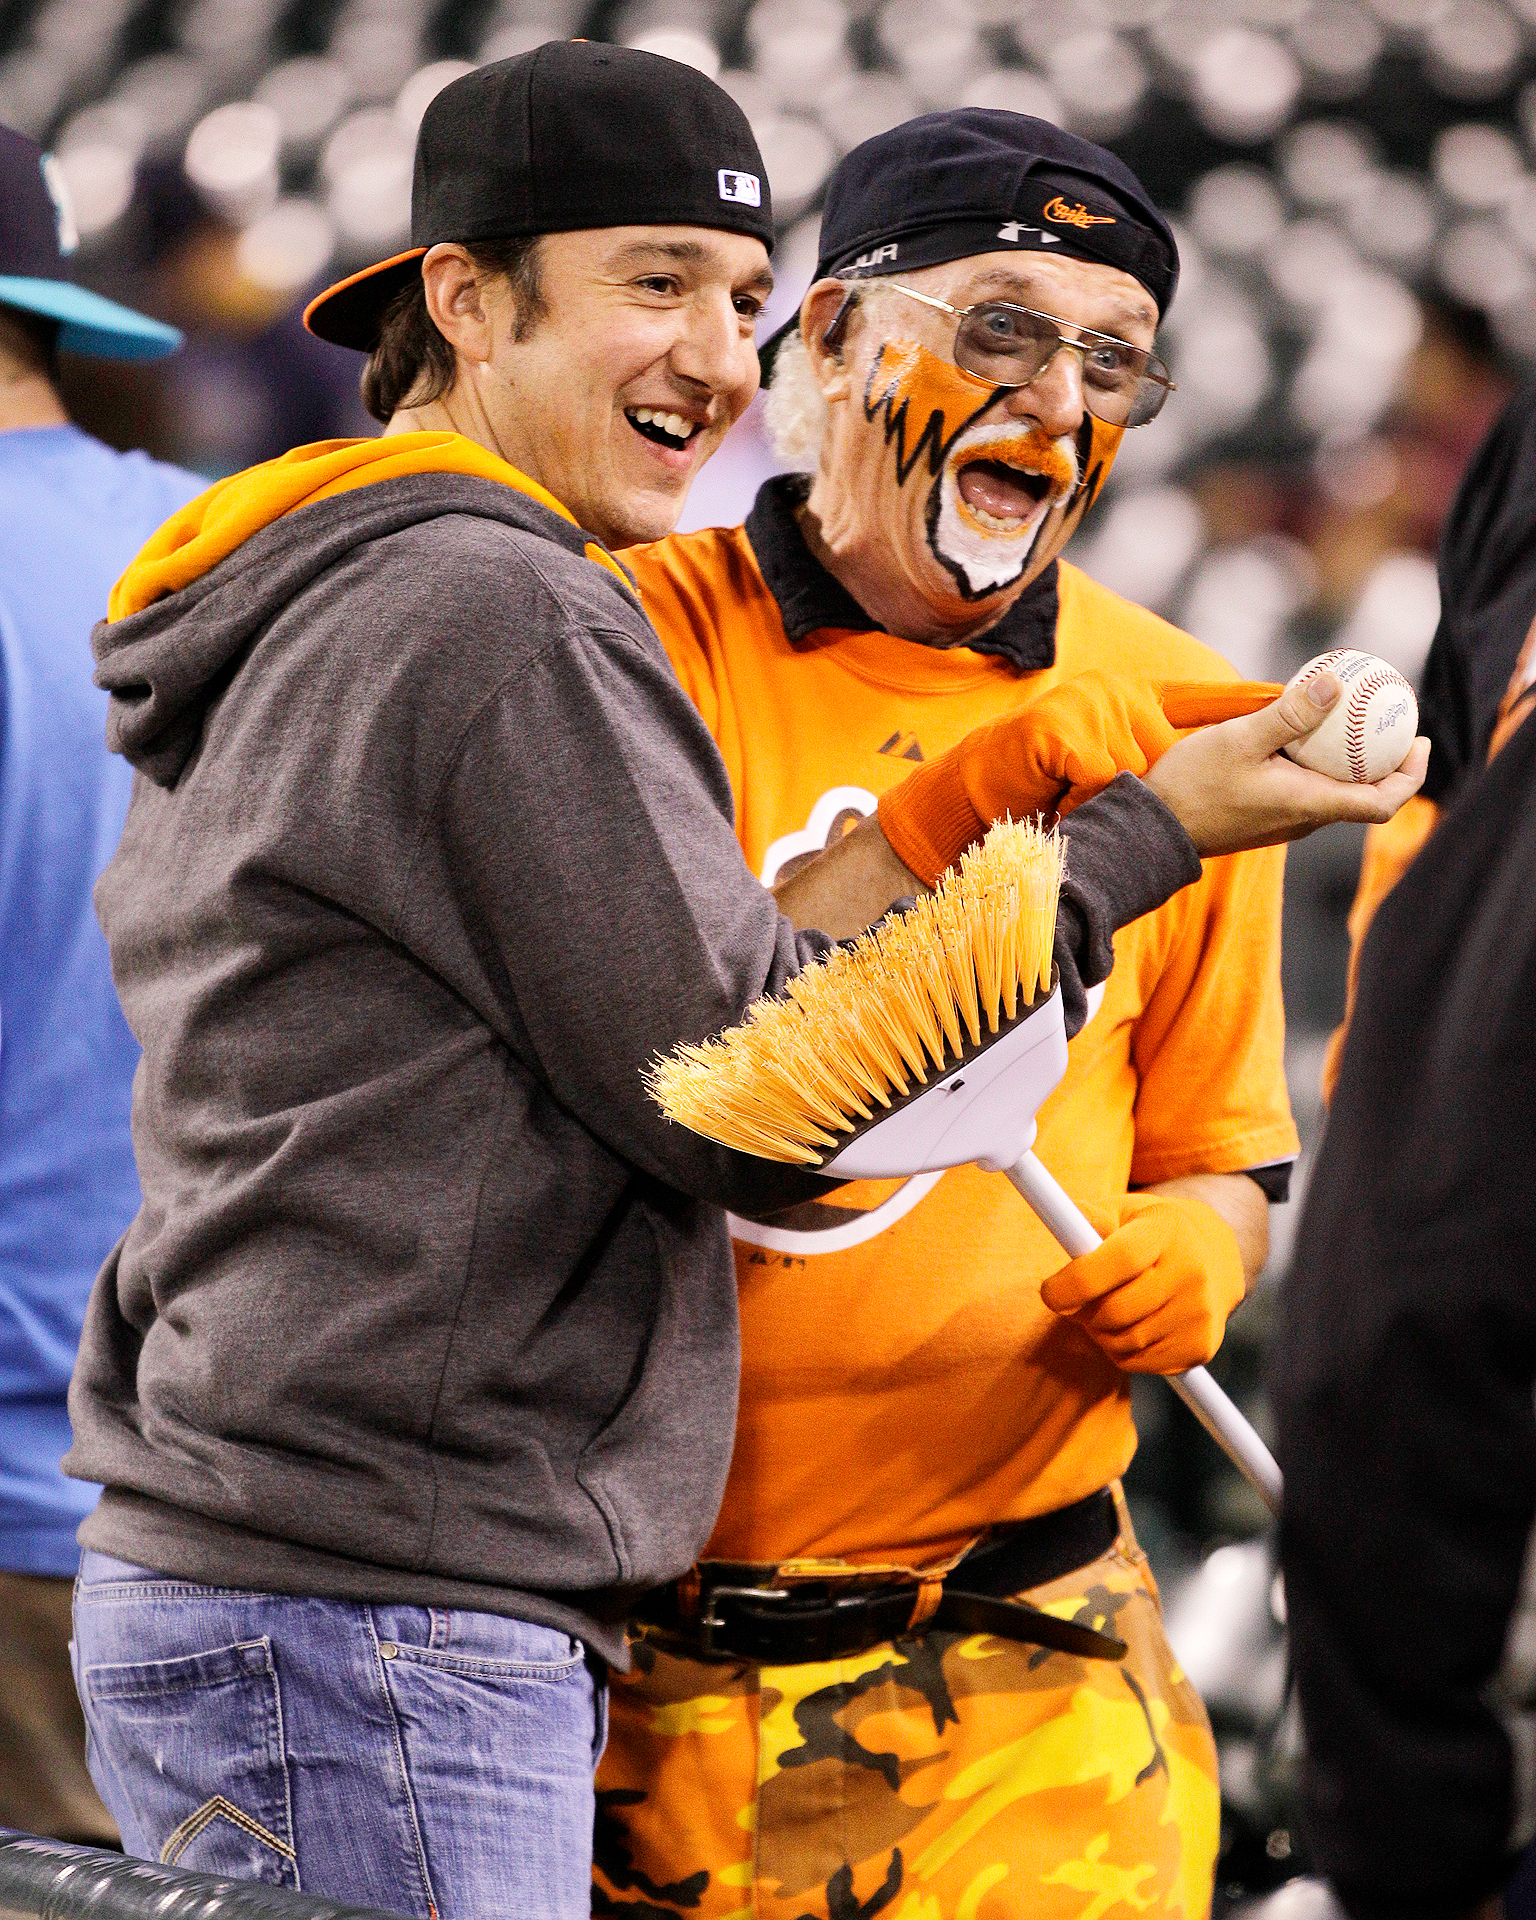 Baltimore Orioles fans